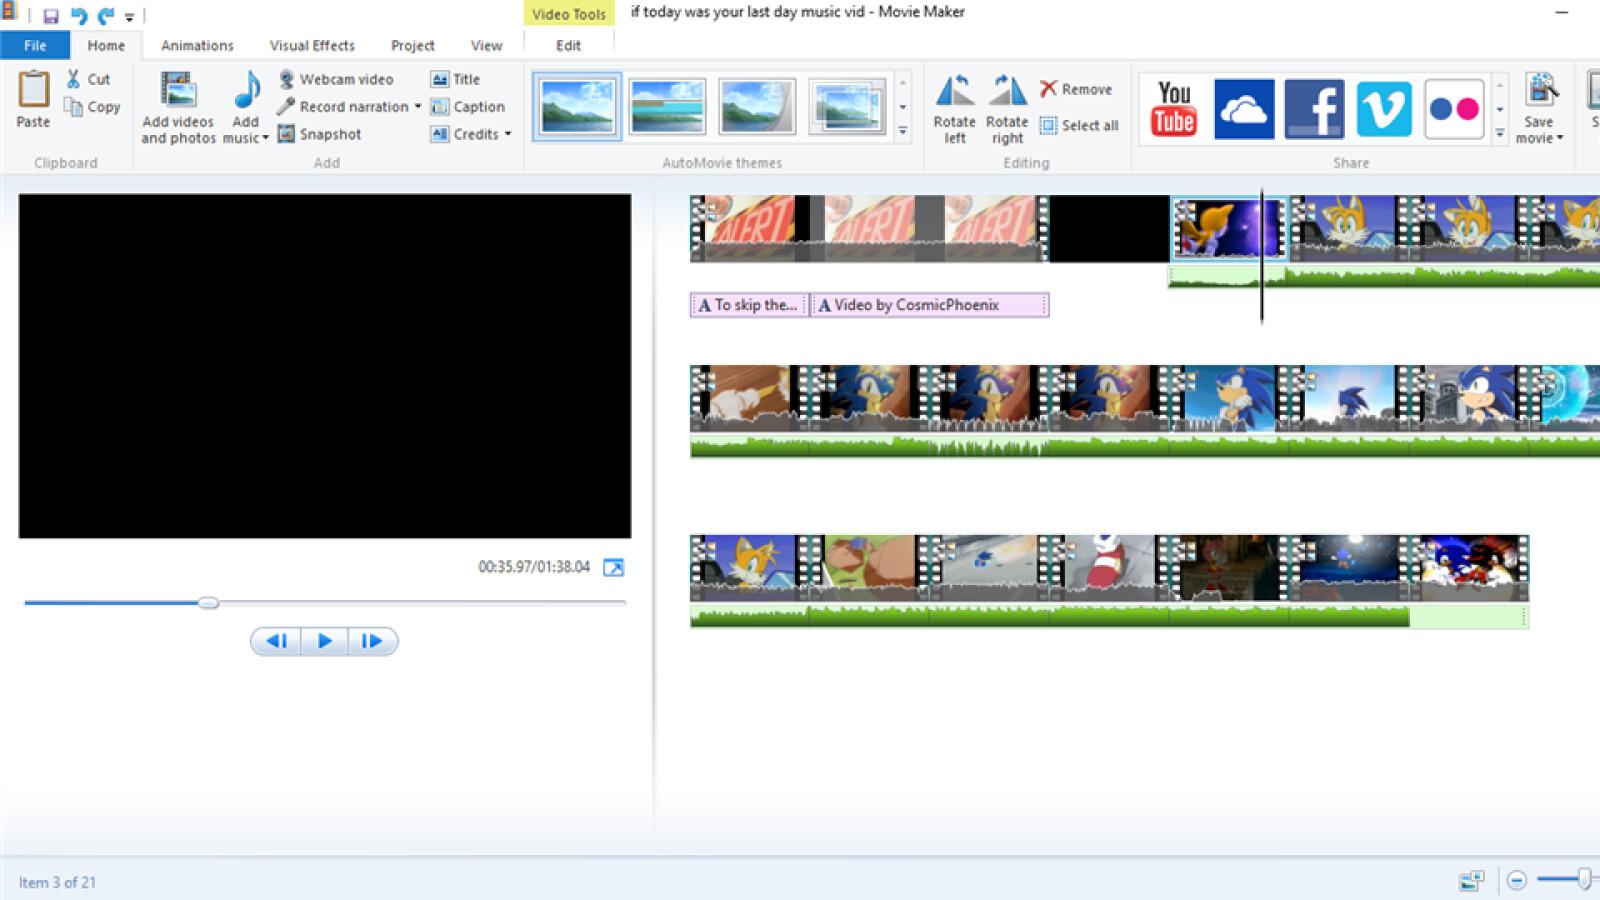 windows live movie maker download windows 7 32 bit